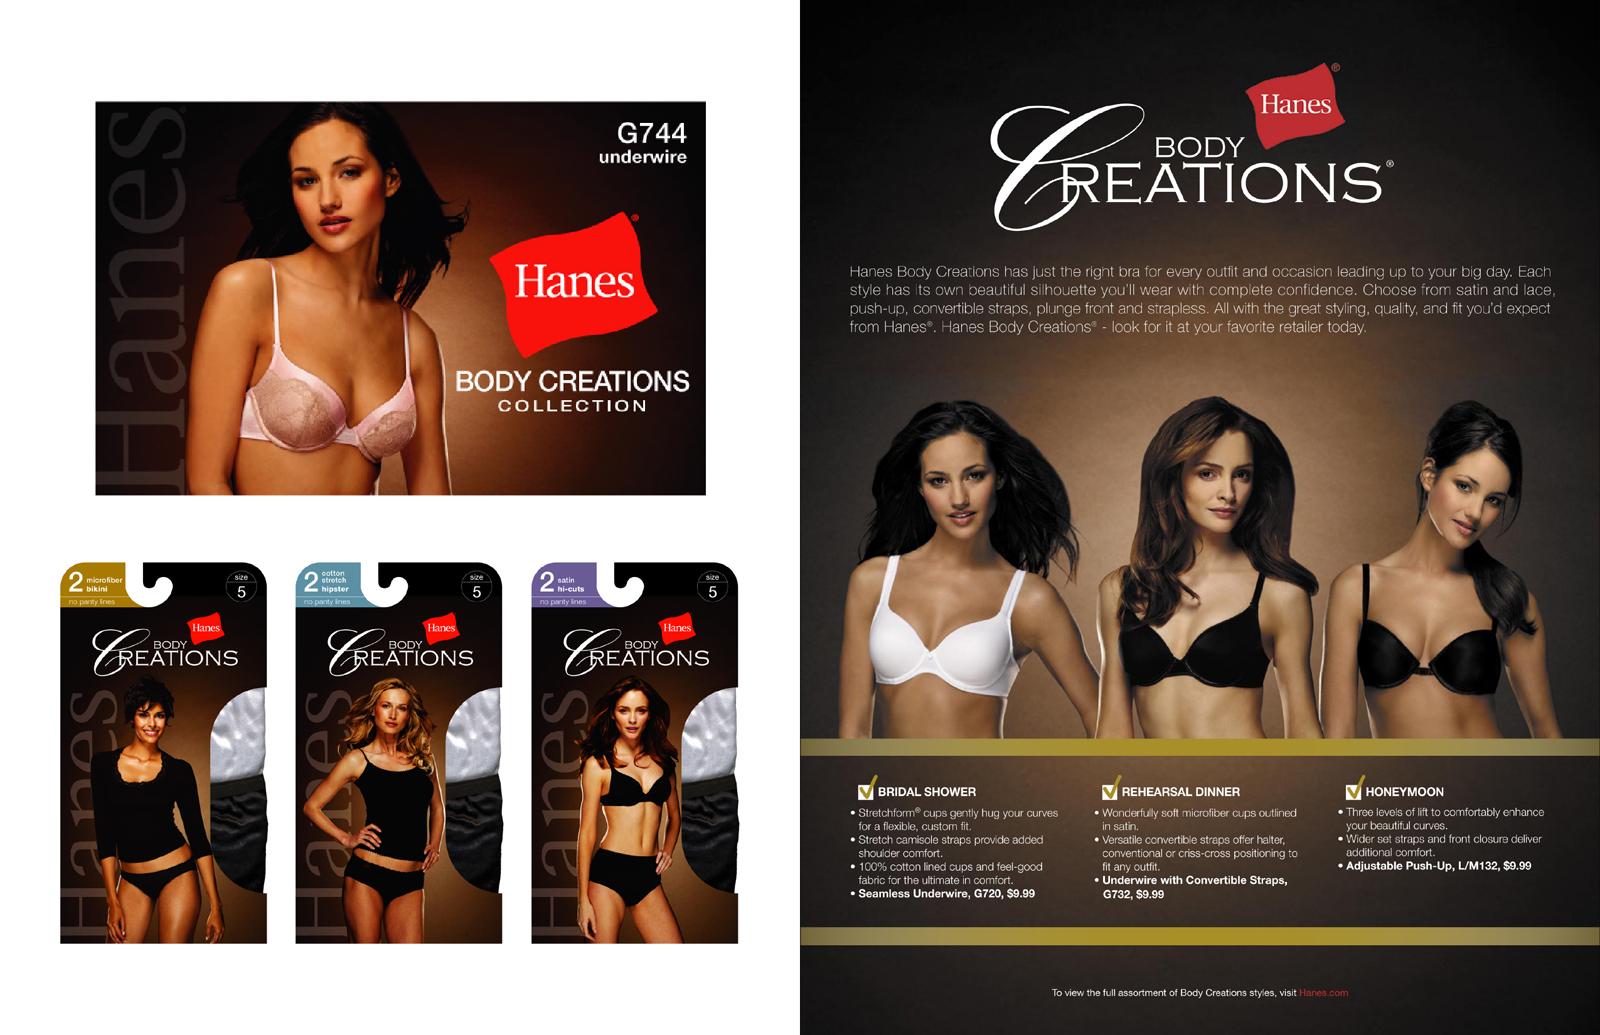 hanes: body creations